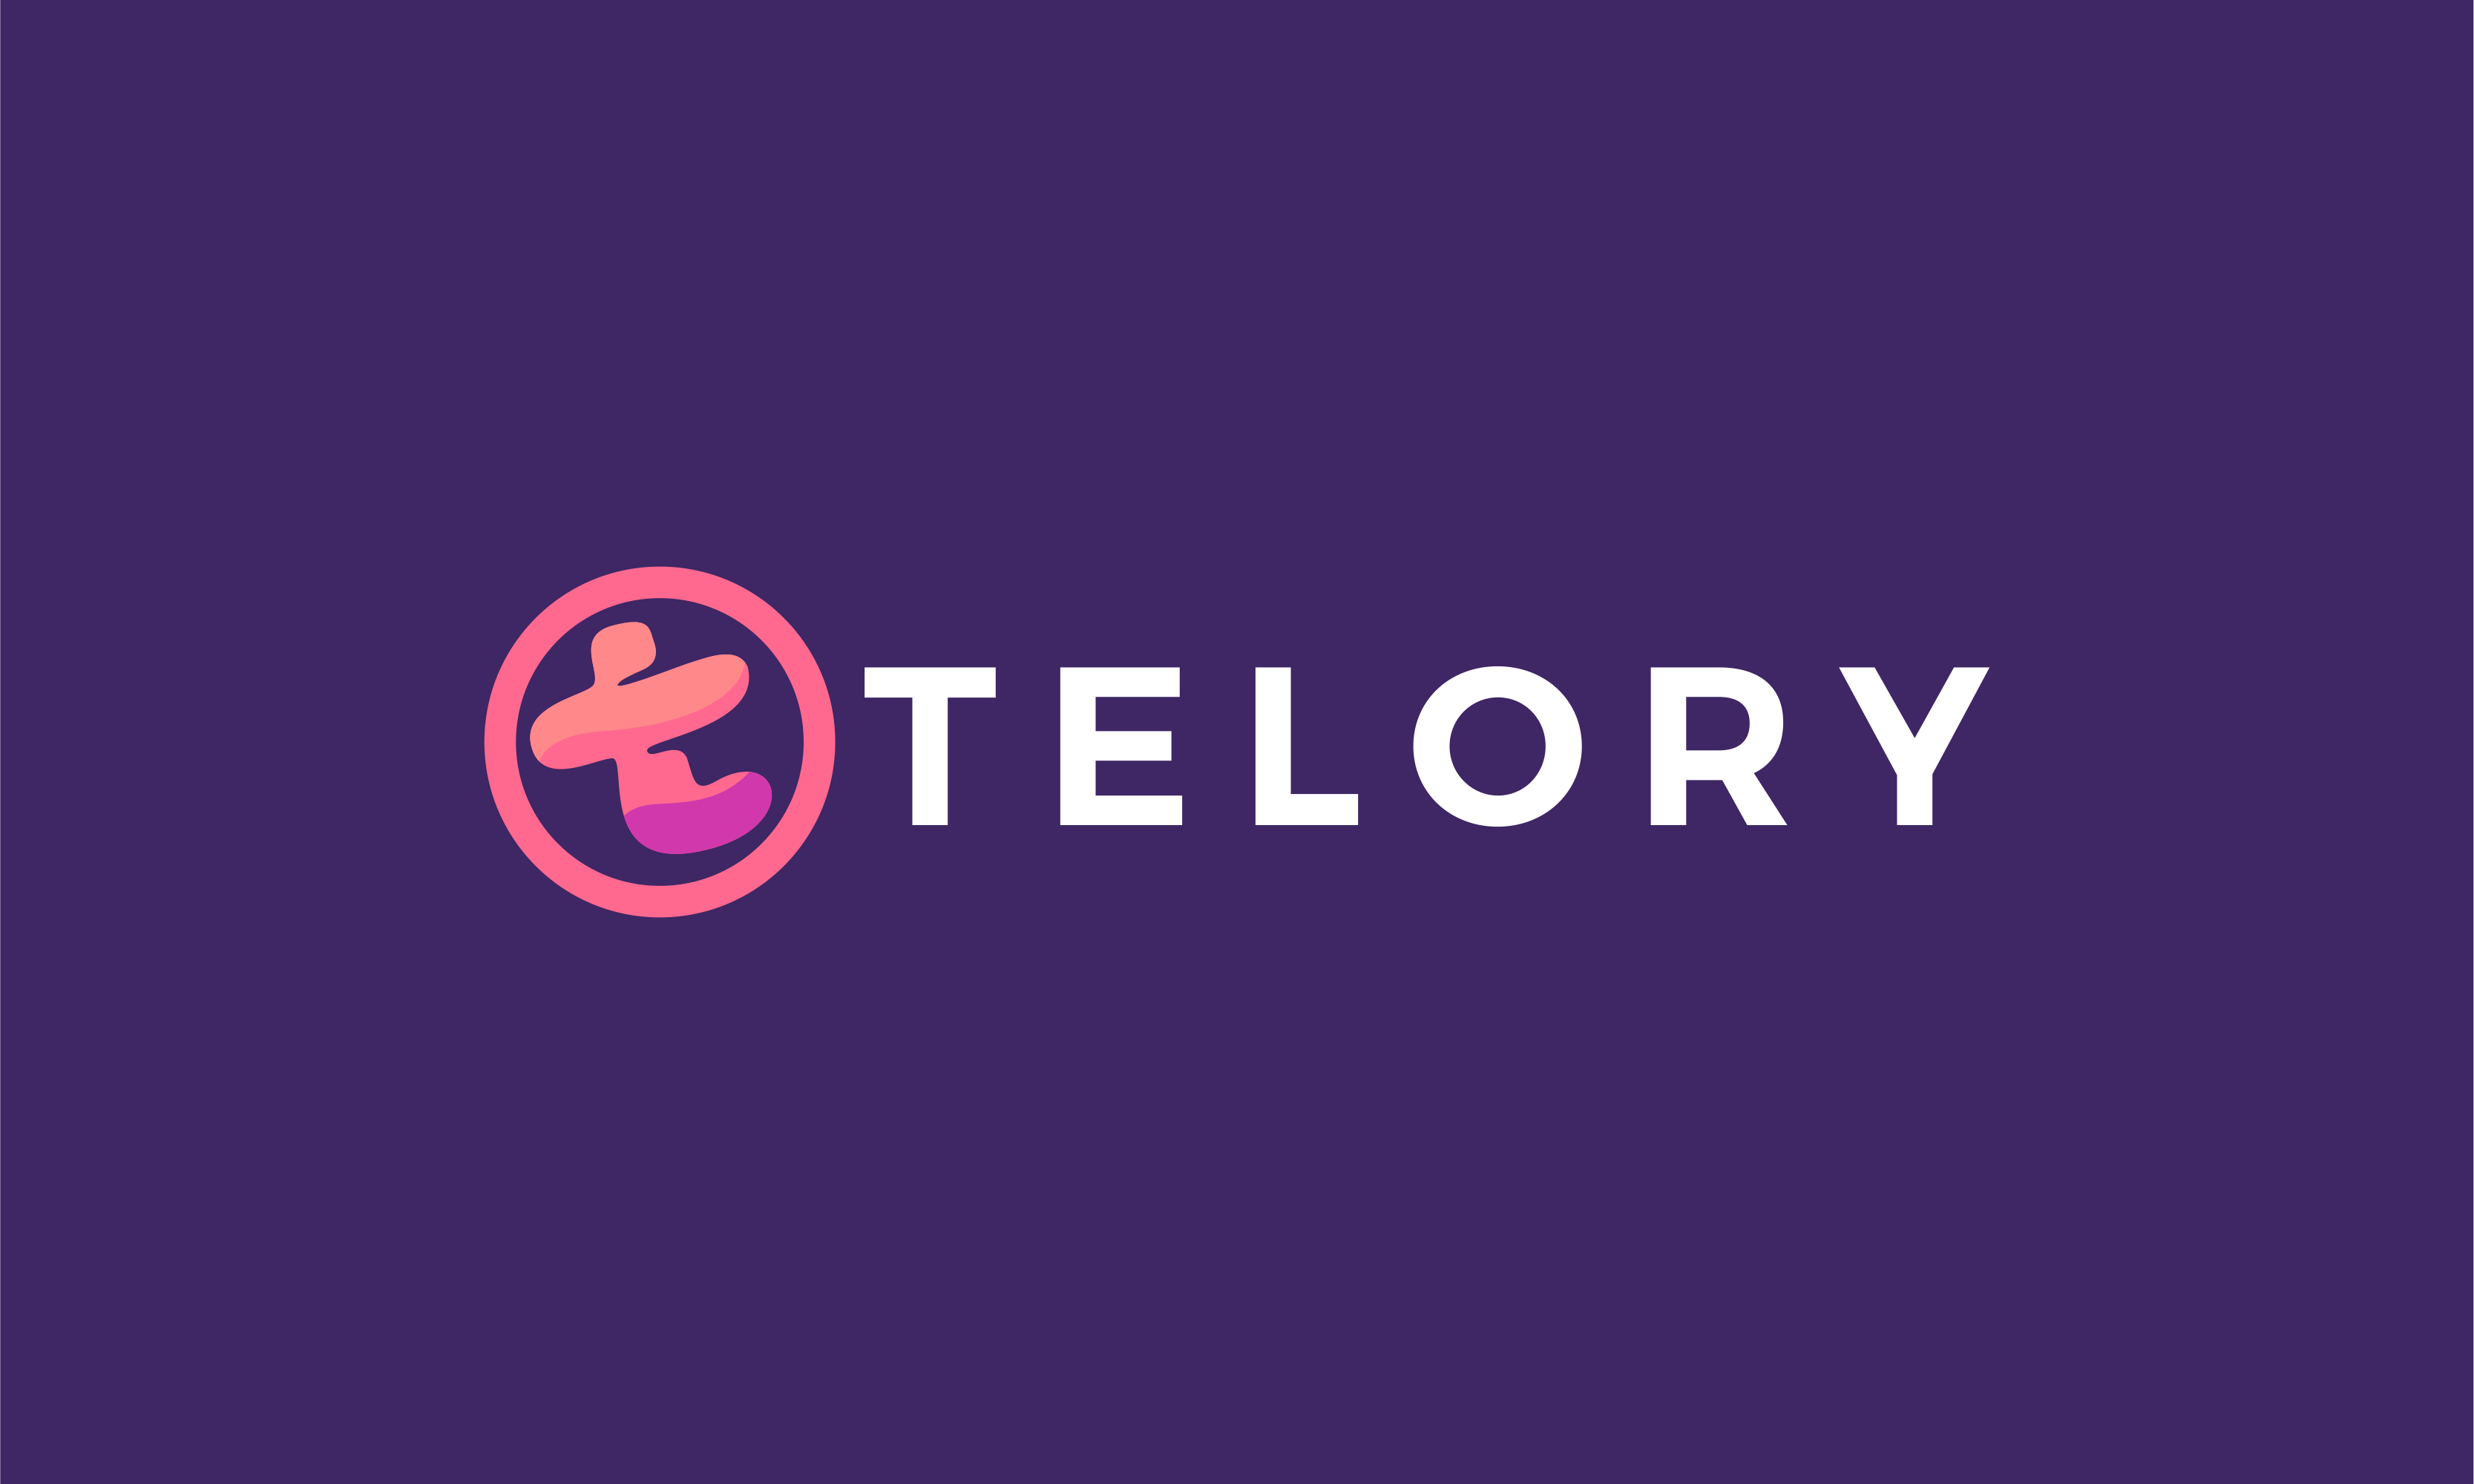 Telory